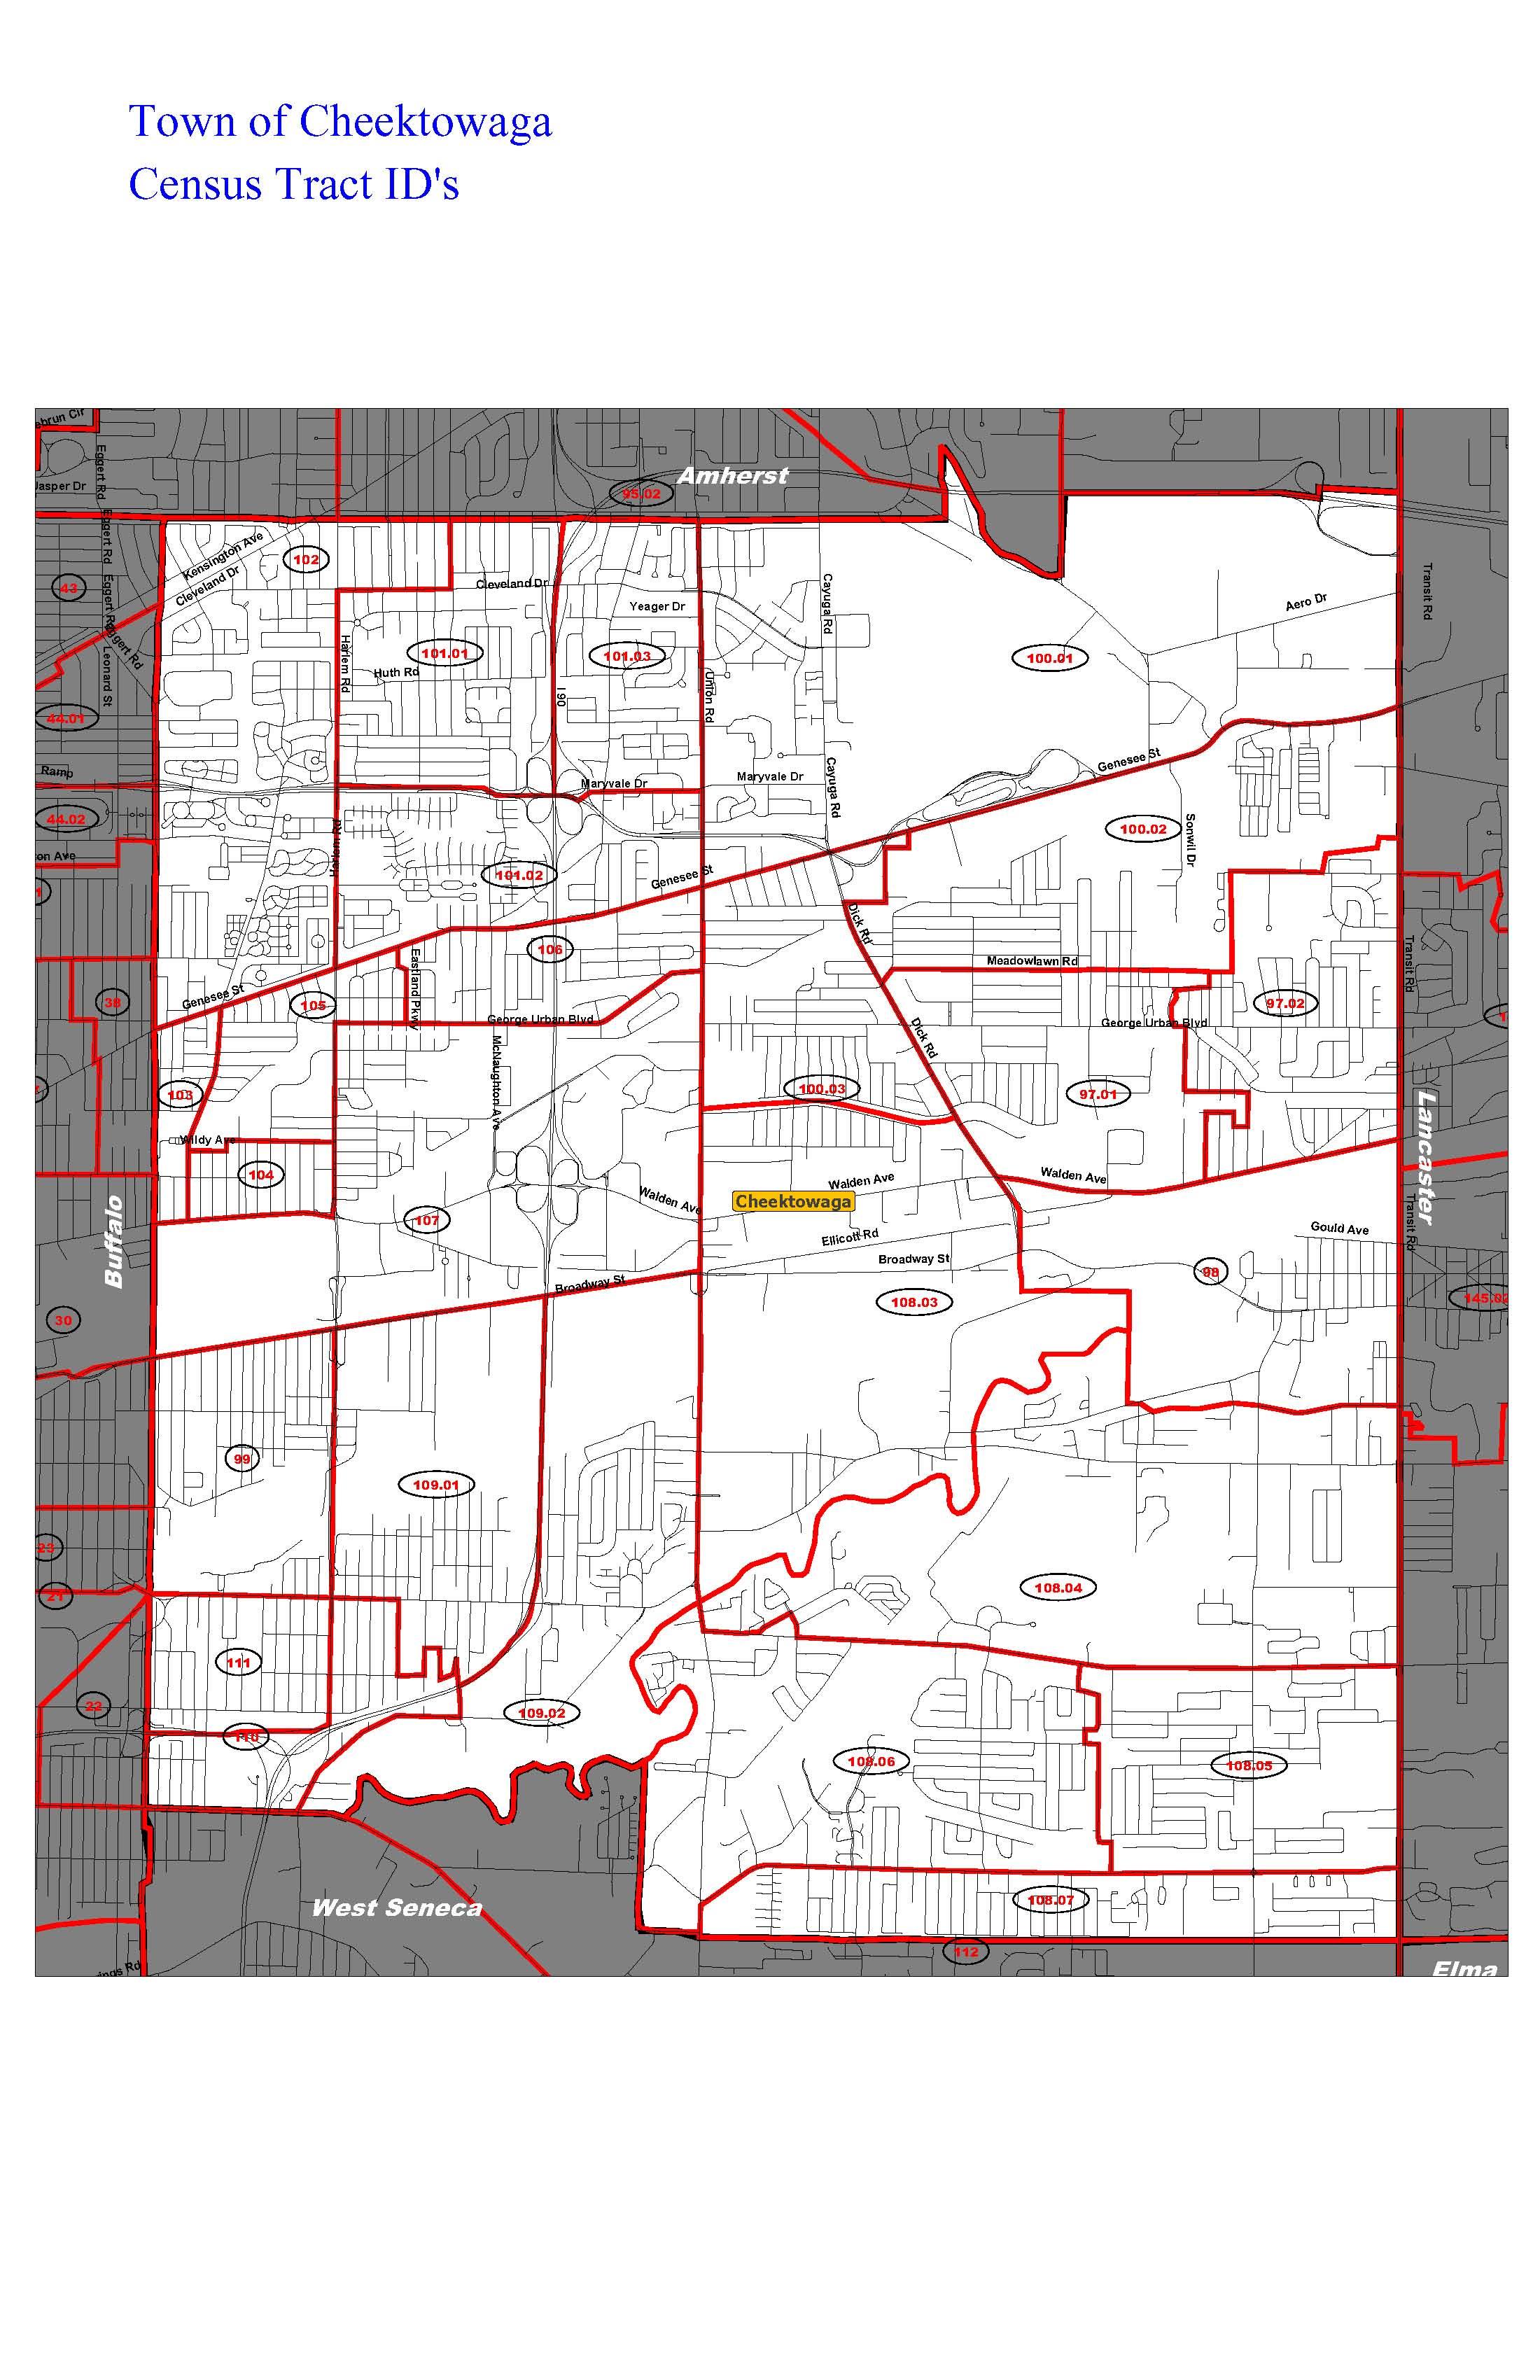 Map of Cheektowaga indicating Census Tracts Erie County Legislature